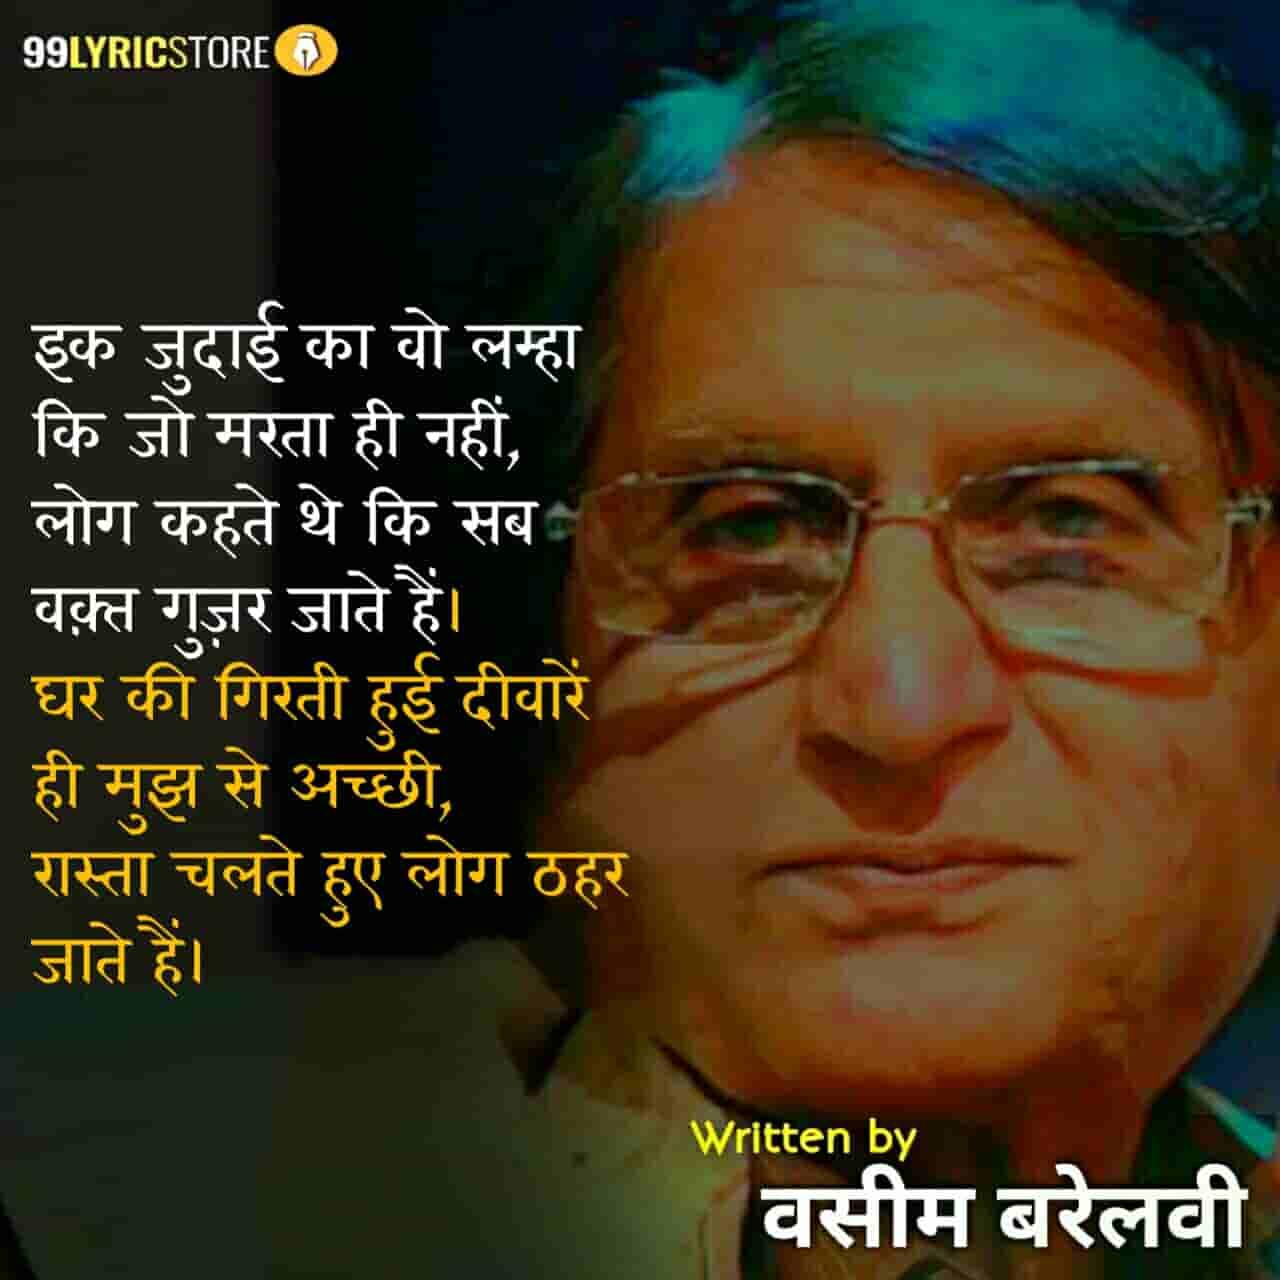 This beautiful ghazal Shaam Tak Subah Ki Nazaron Se has written by Waseem Barelvi.